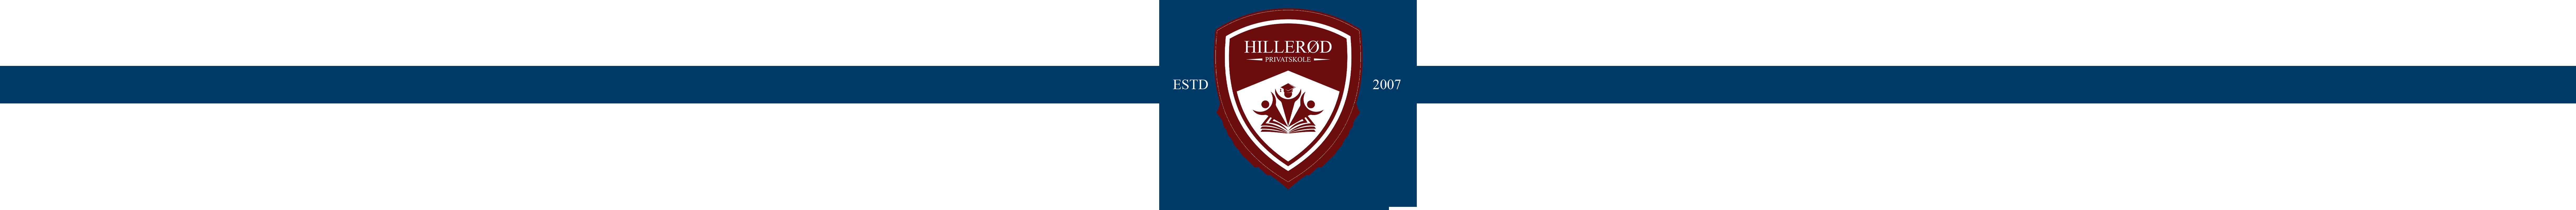 Hillerød Privatskole logo-long-band-both